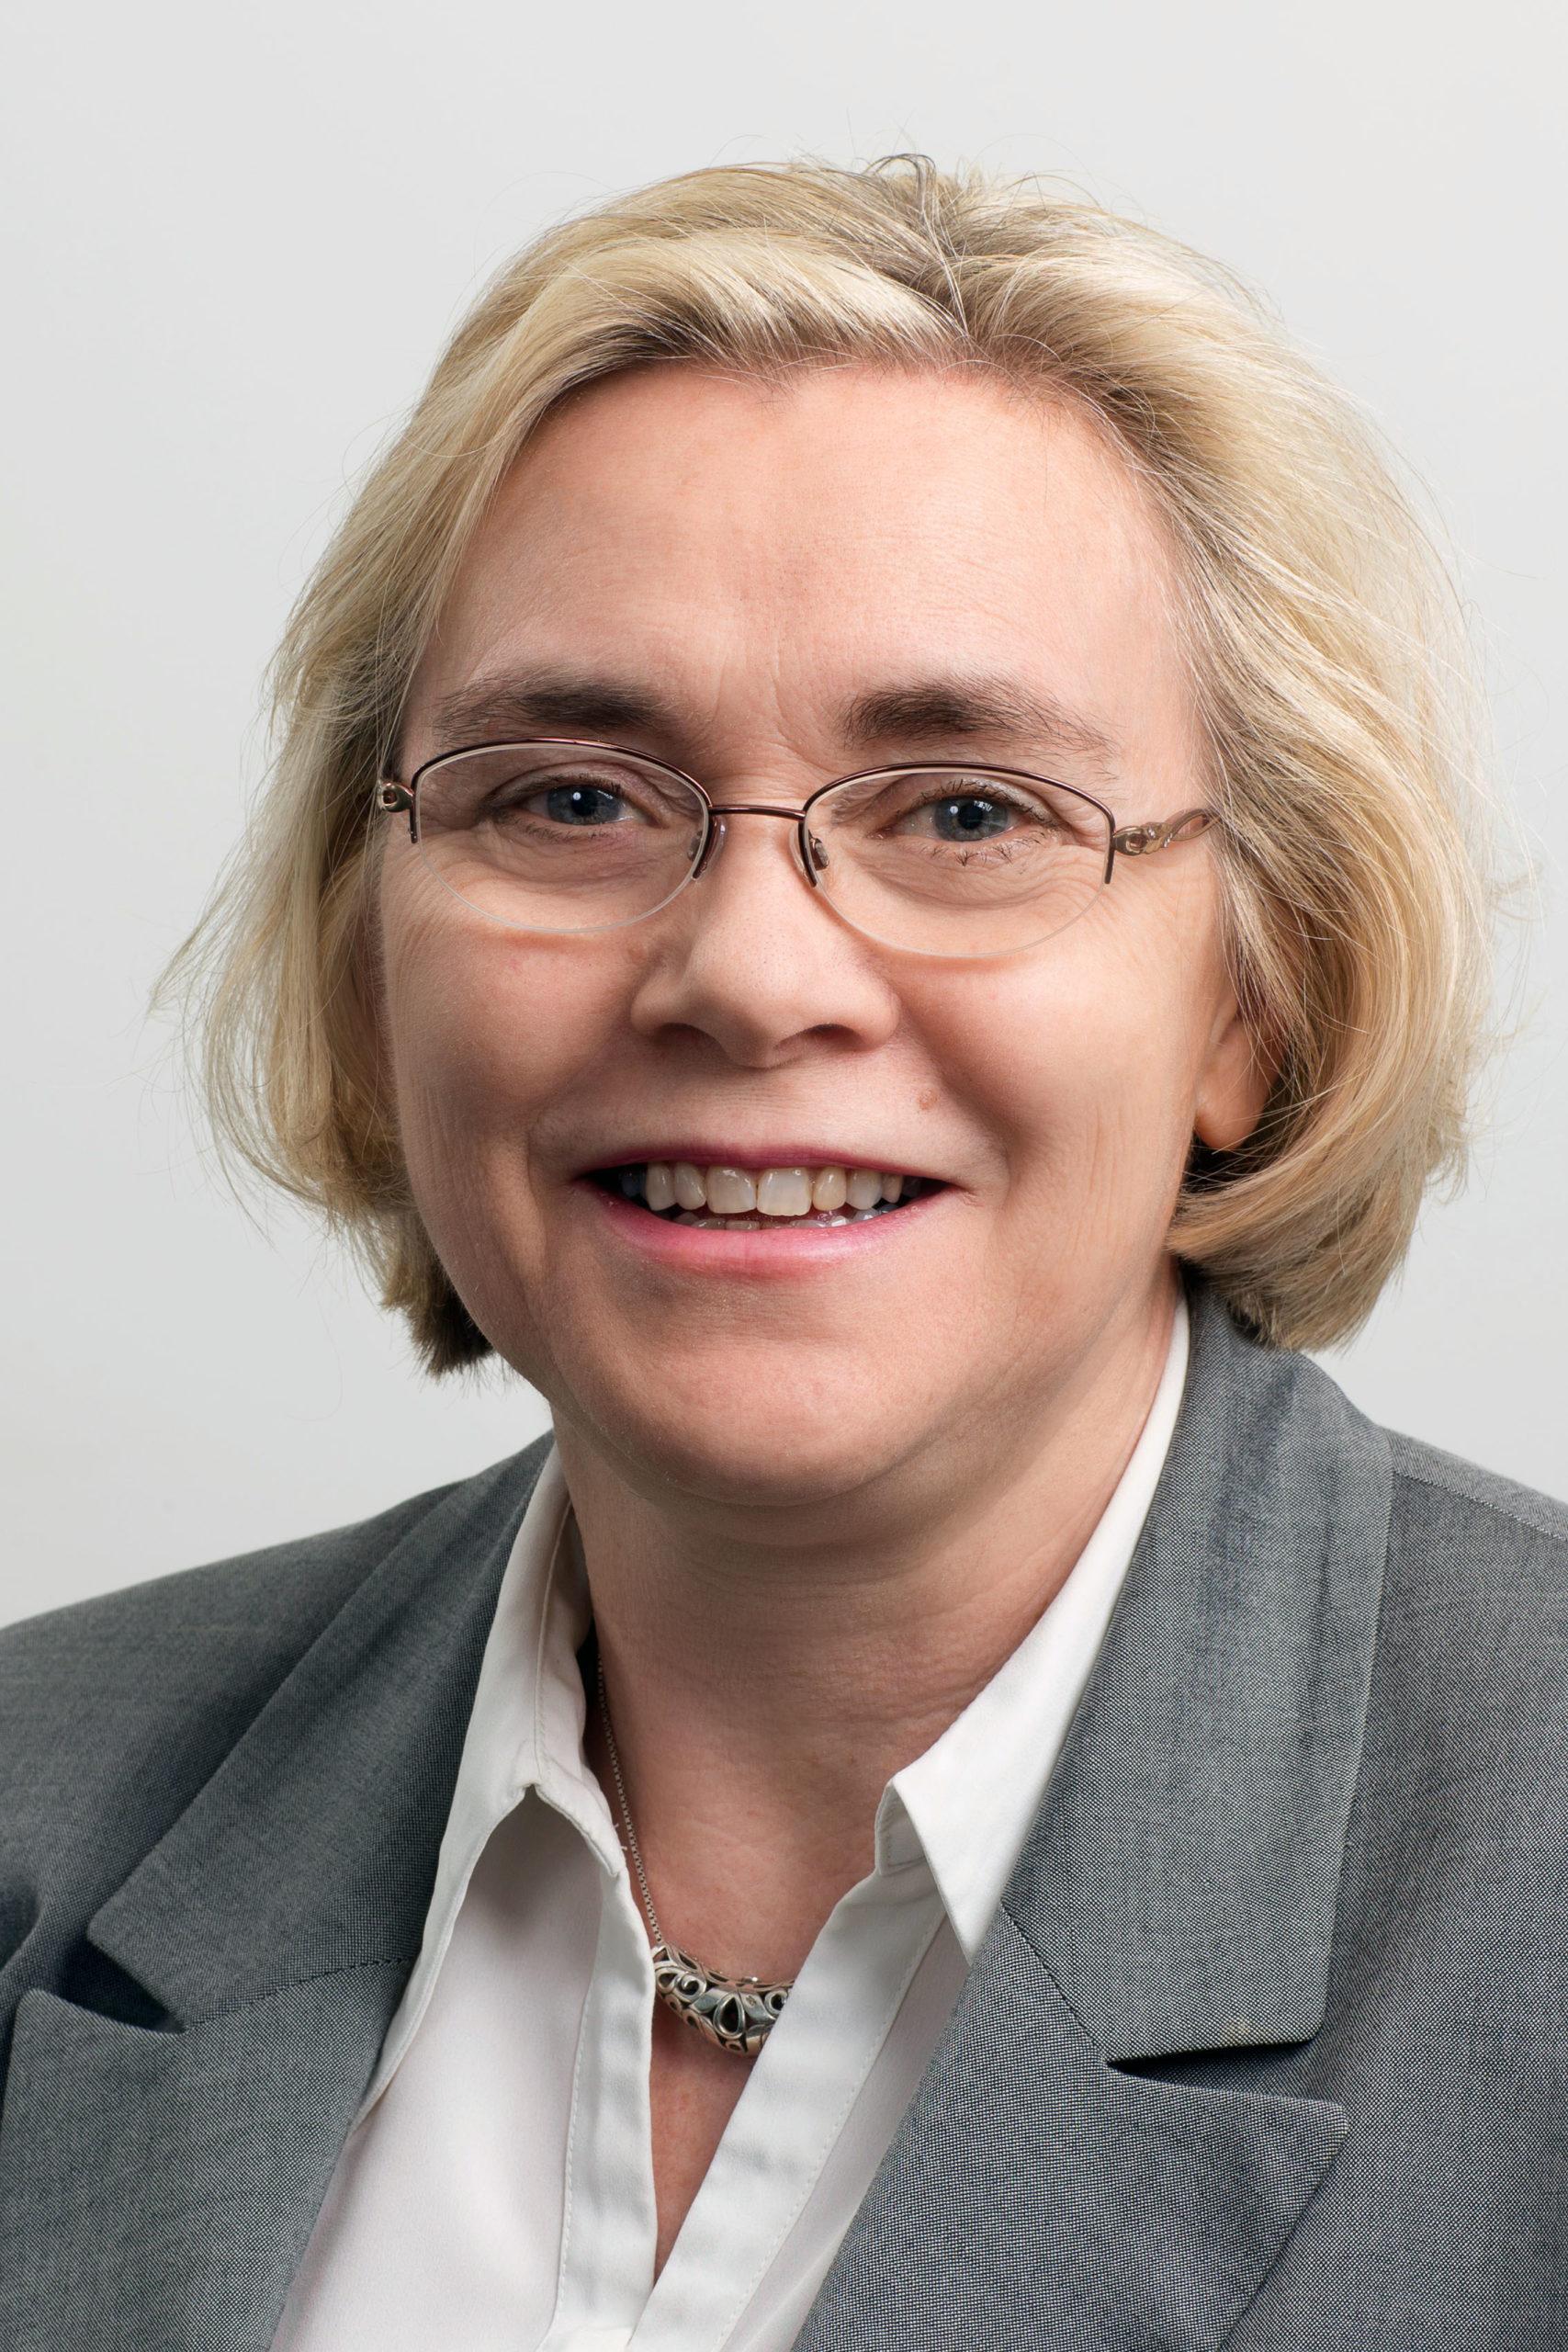 Advokat Solveig-Brorson-Olsen